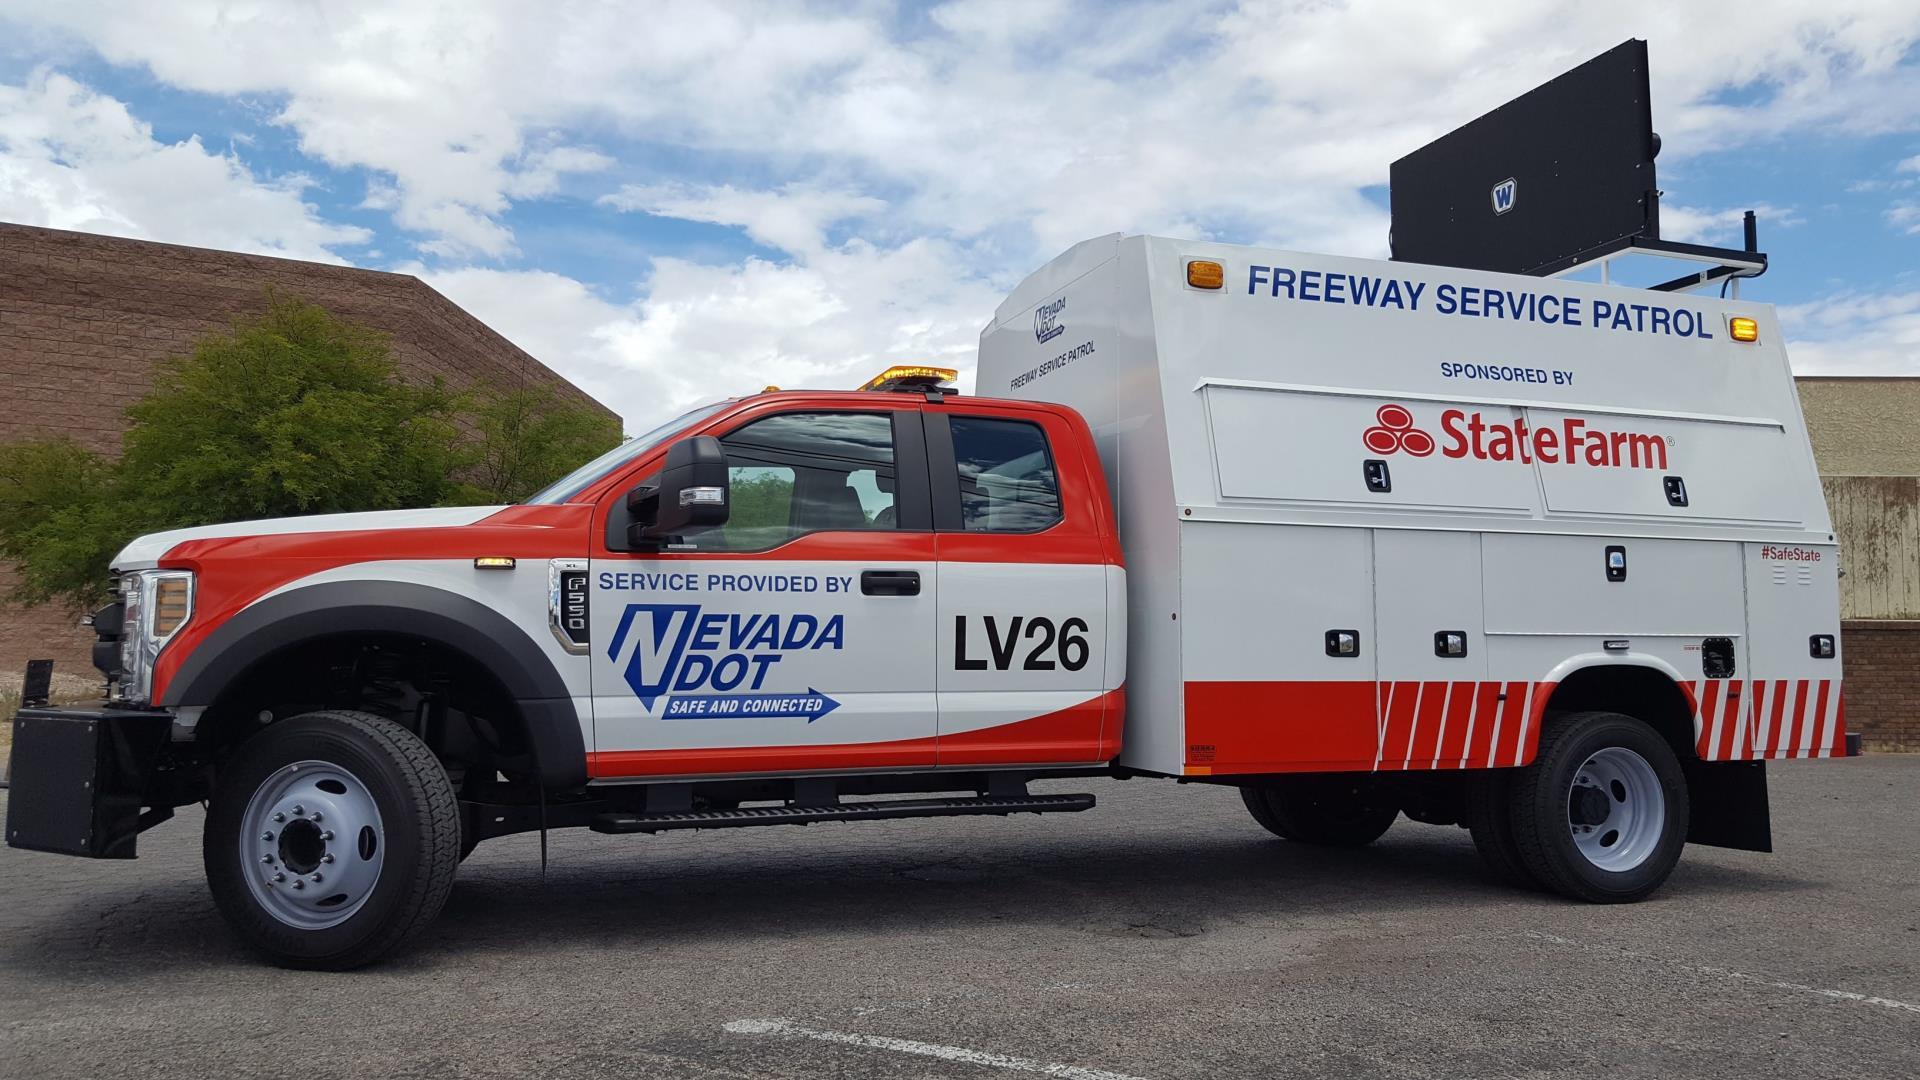 Roadside Assistance State Farm >> Freeway Service Patrol | Nevada Department of Transportation